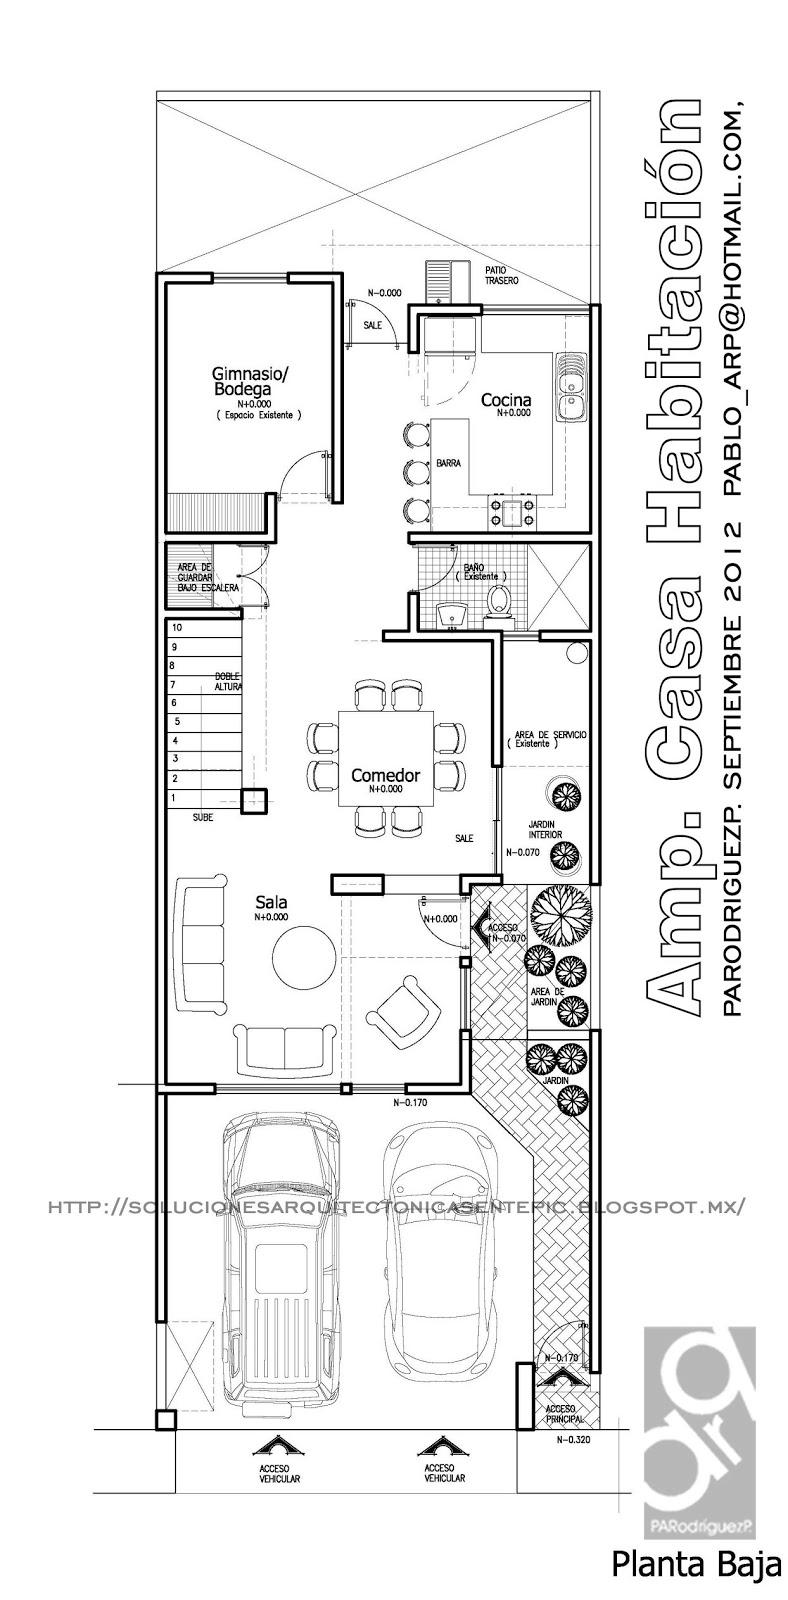 Soluciones arquitectonicas remodelaci n de casa for Dimensiones arquitectonicas